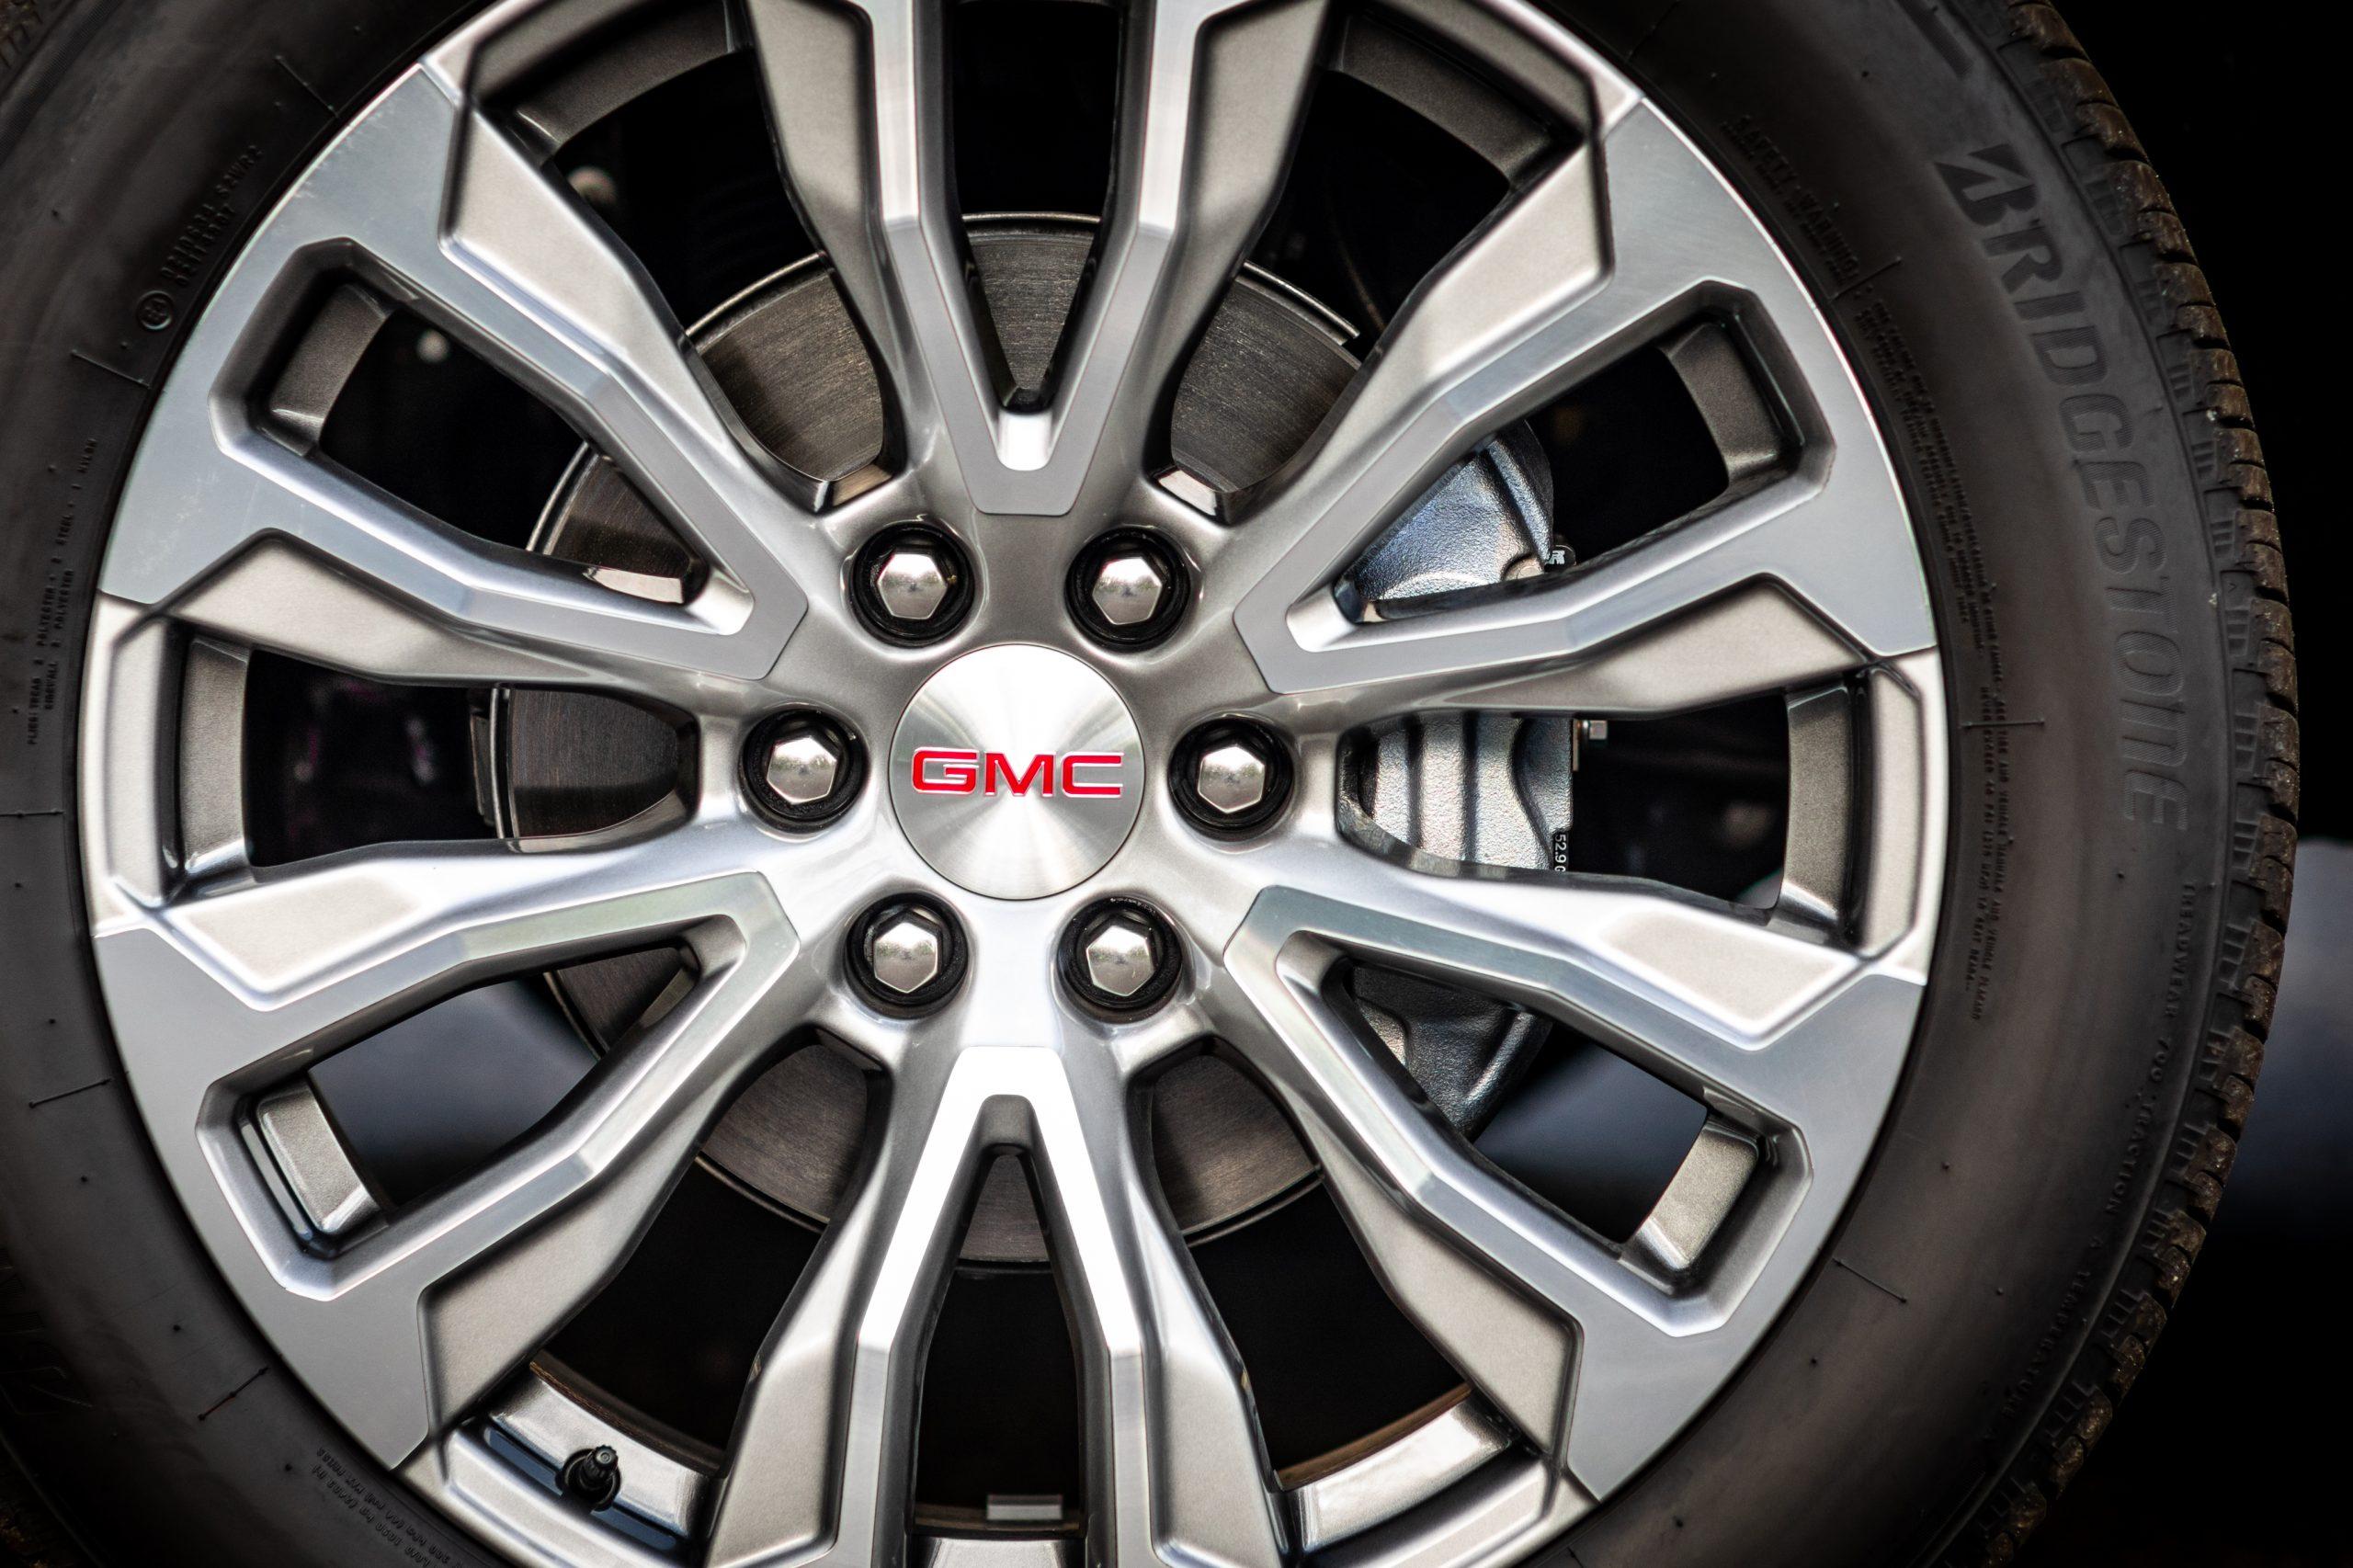 2021 Yukon Denali 22-inch wheel